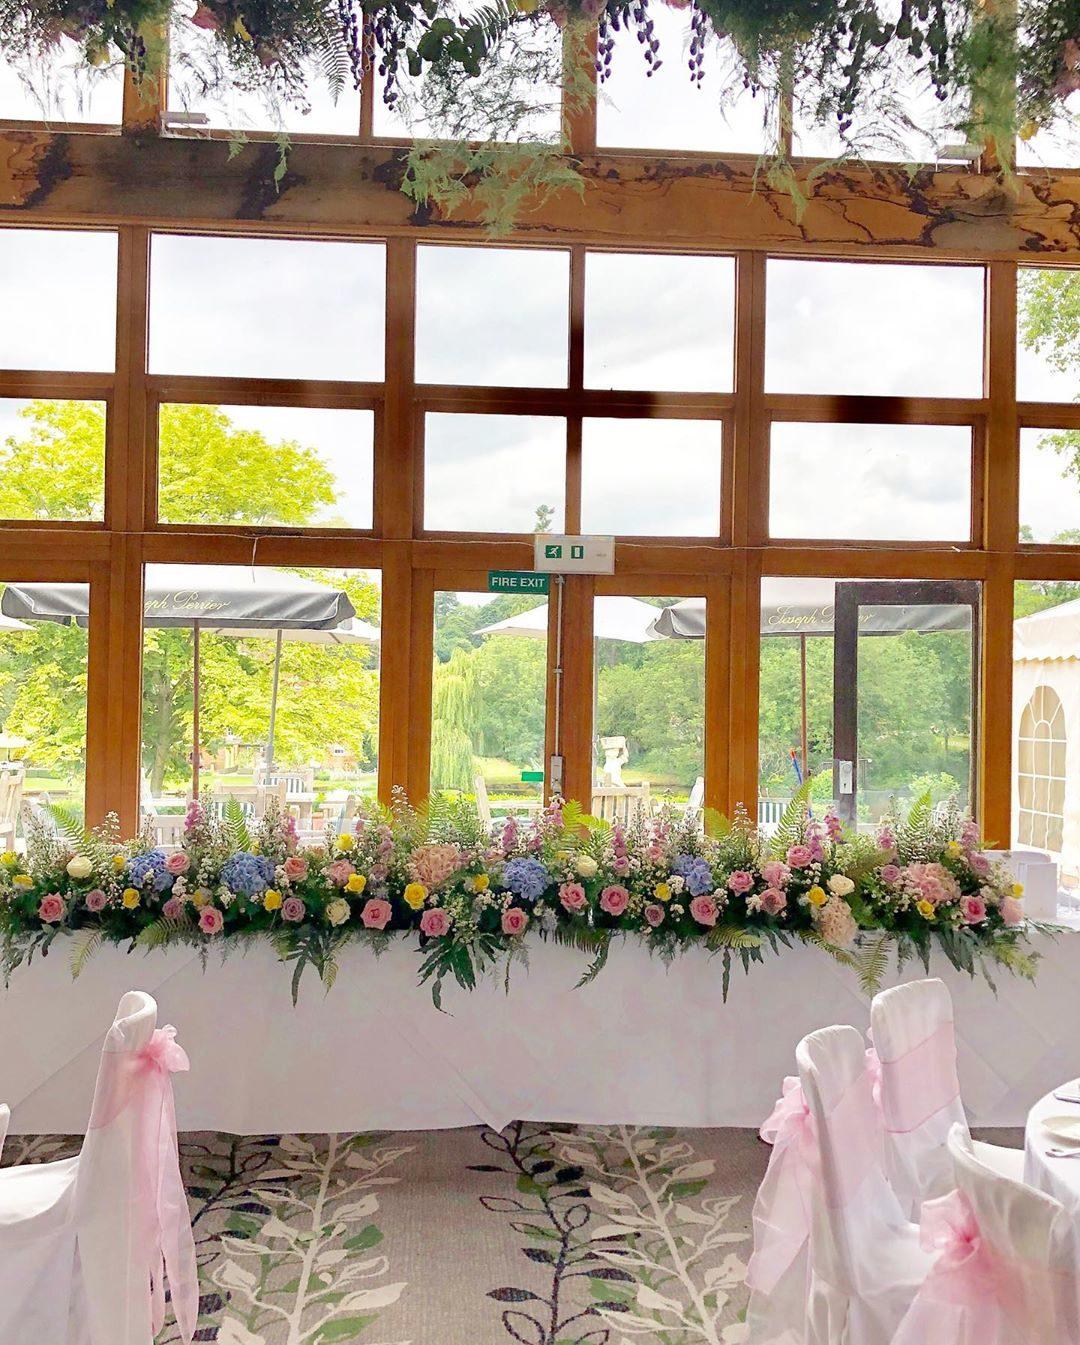 Wild Flowers For Wedding: Wild Flower Wedding @ Brocket Hall